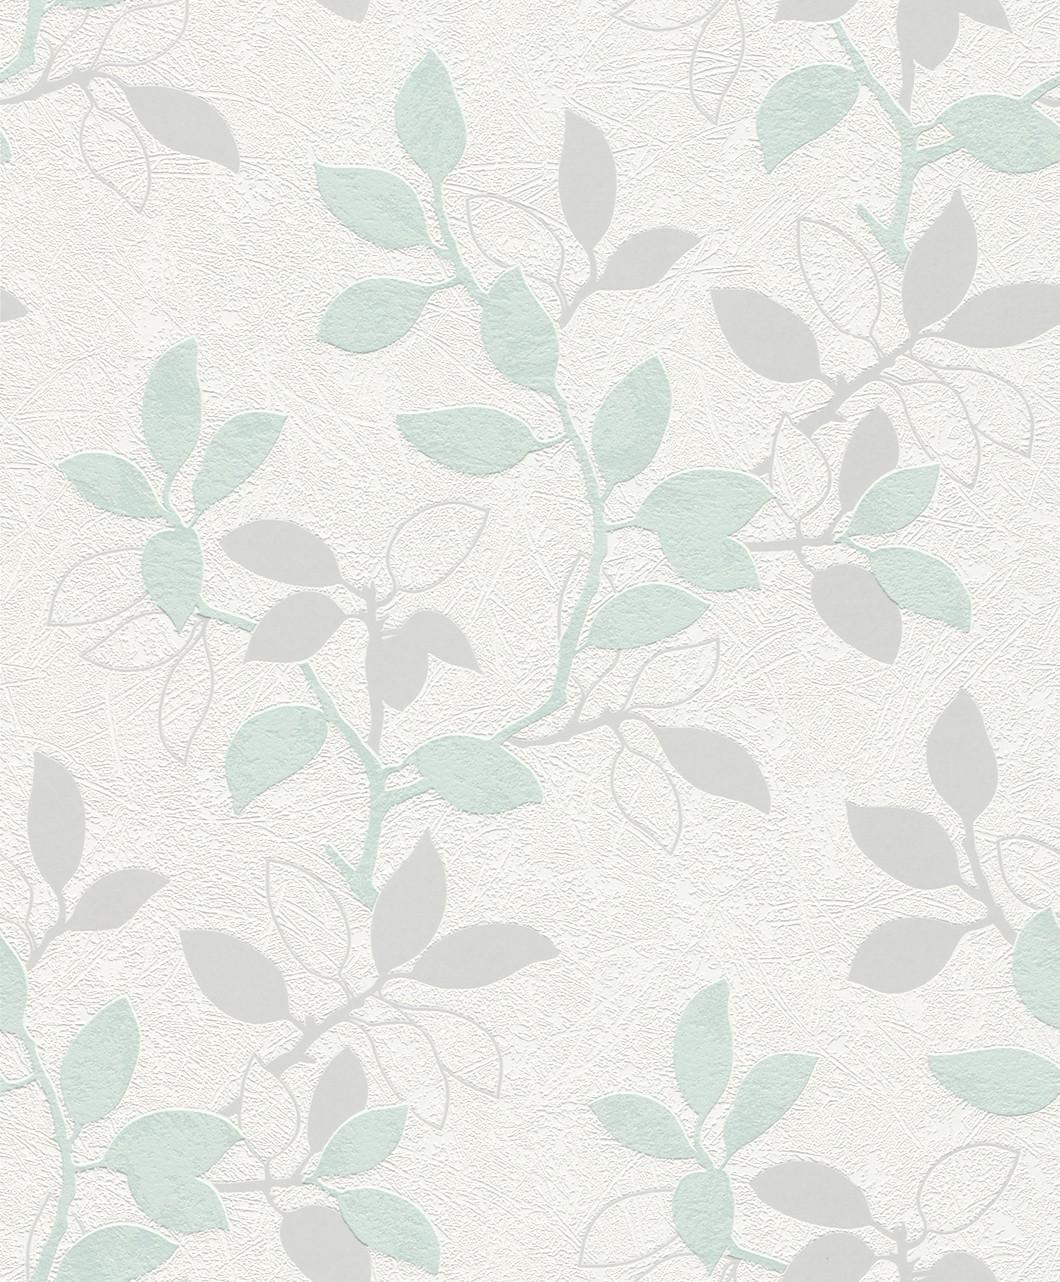 vliestapete wei gr n silber bl tter rasch home vision 4 spring time tapete 431414. Black Bedroom Furniture Sets. Home Design Ideas